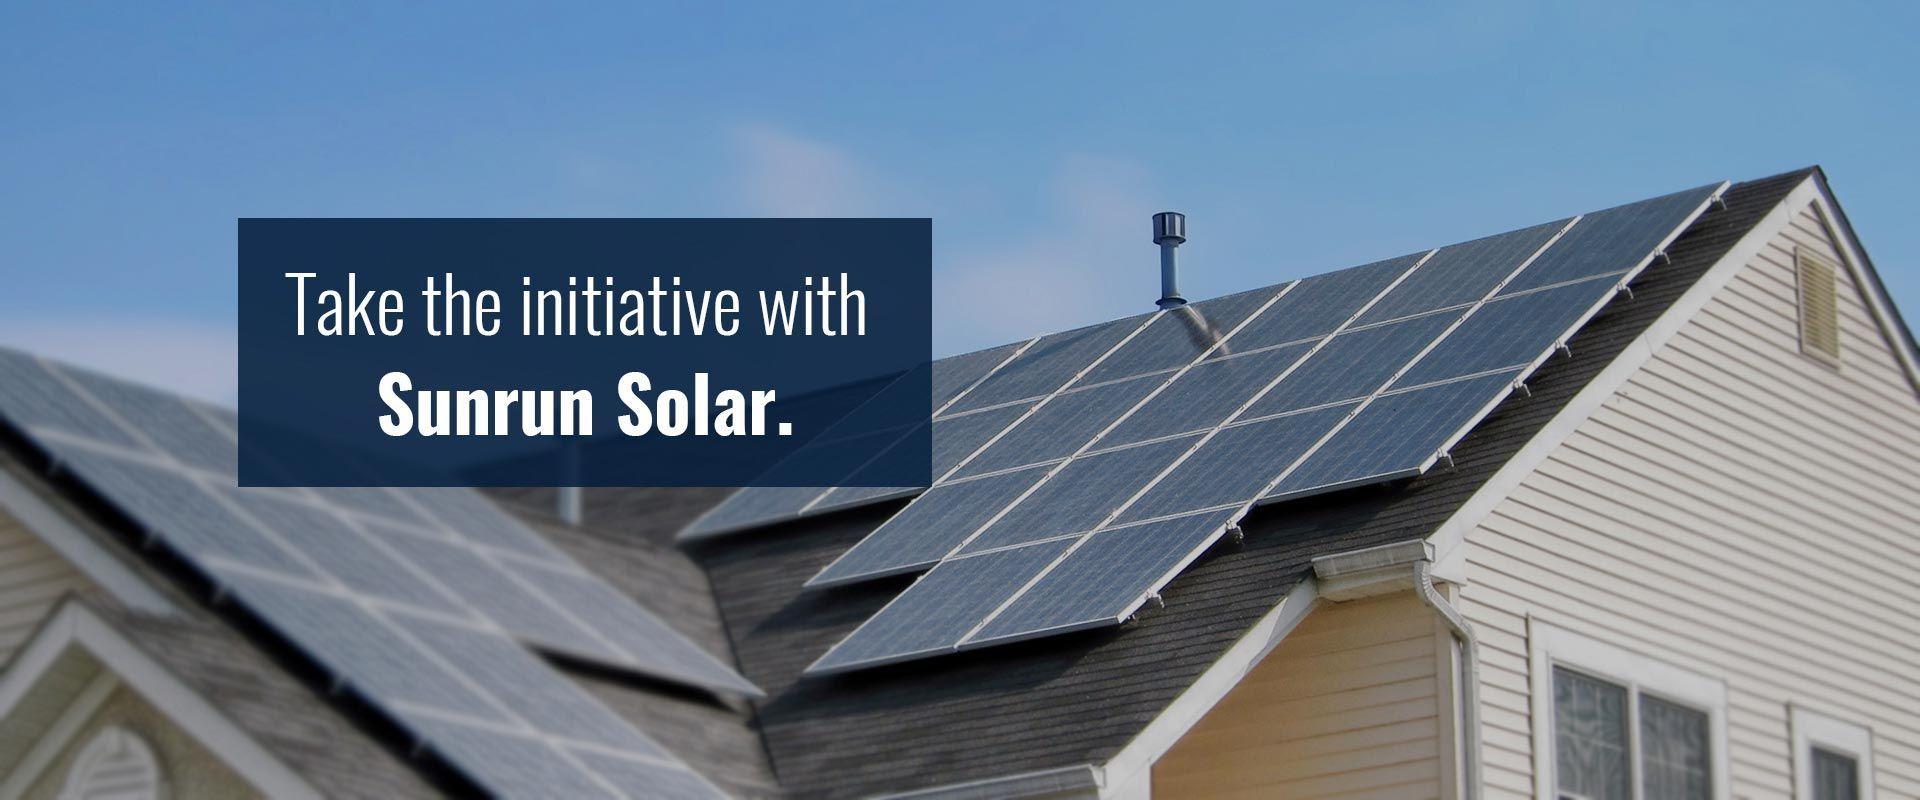 Melbourne Solar Panels Victoria Solar Panels Australia Solar Panels Solar Energy Melbourne Solar Panels Victoria S In 2020 Solar Solar Energy Facts Solar Panels